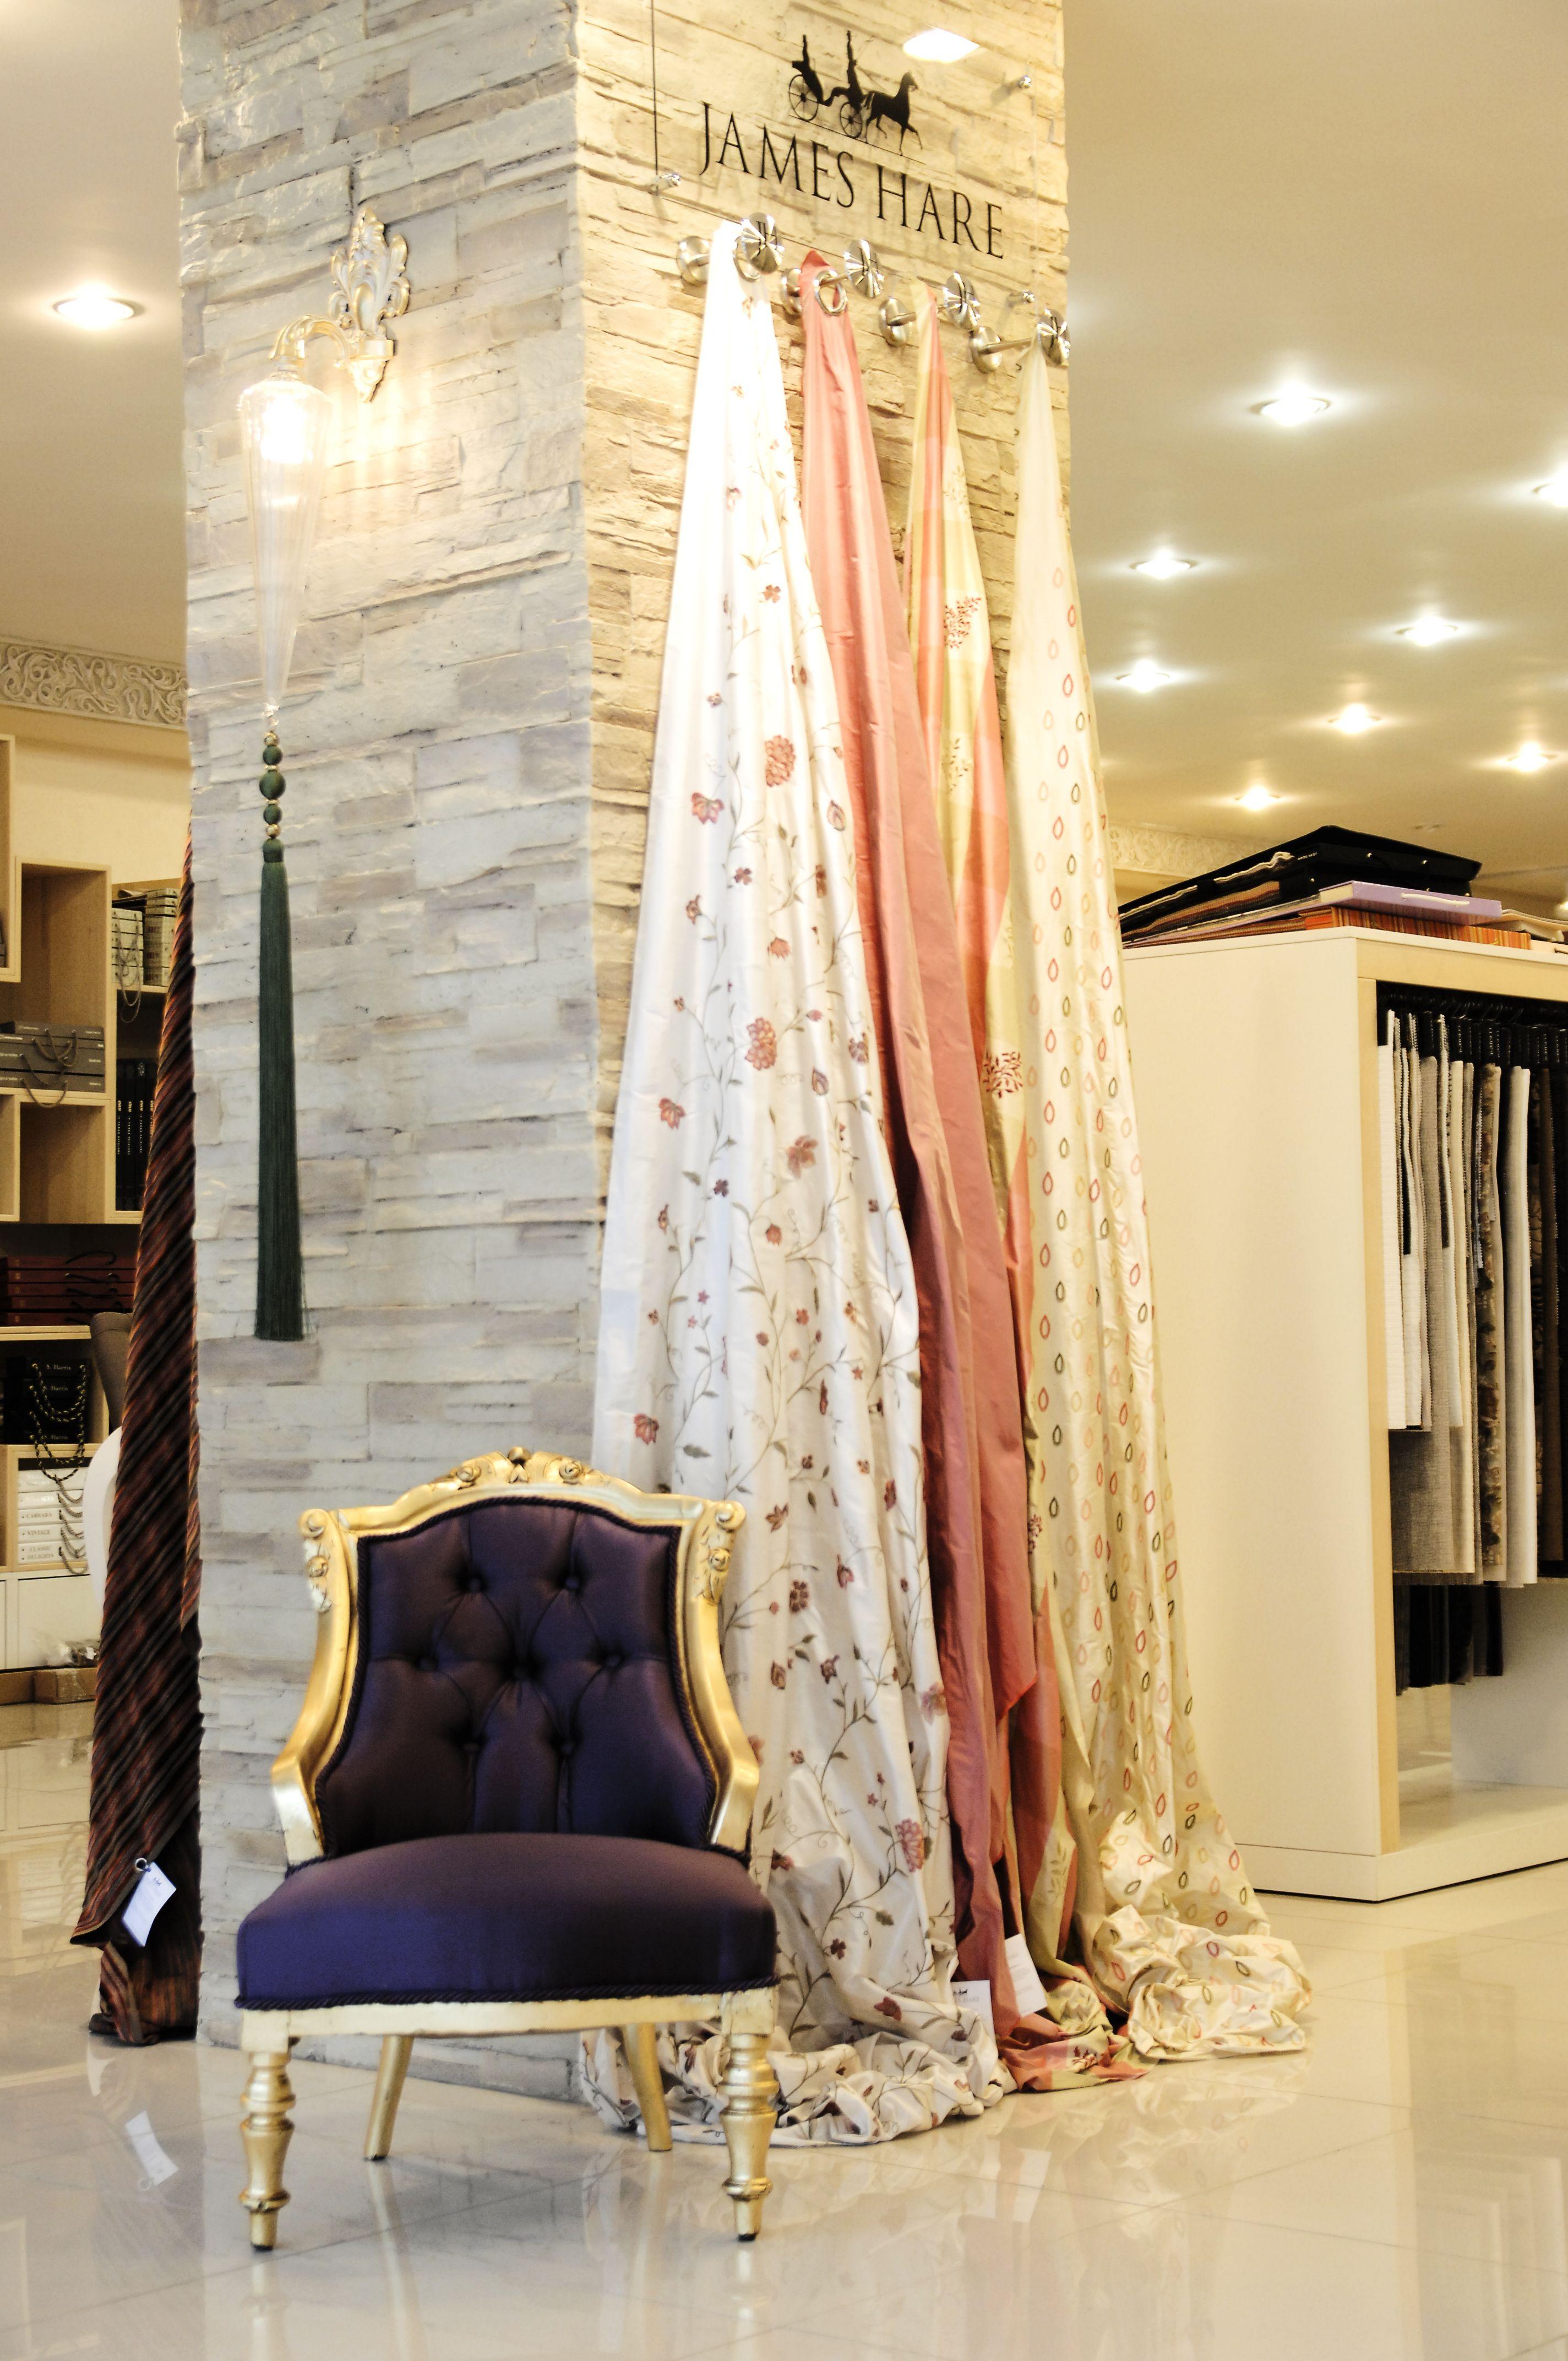 Ikon Perde Showroom Showroom Design Curtain Store Curtains